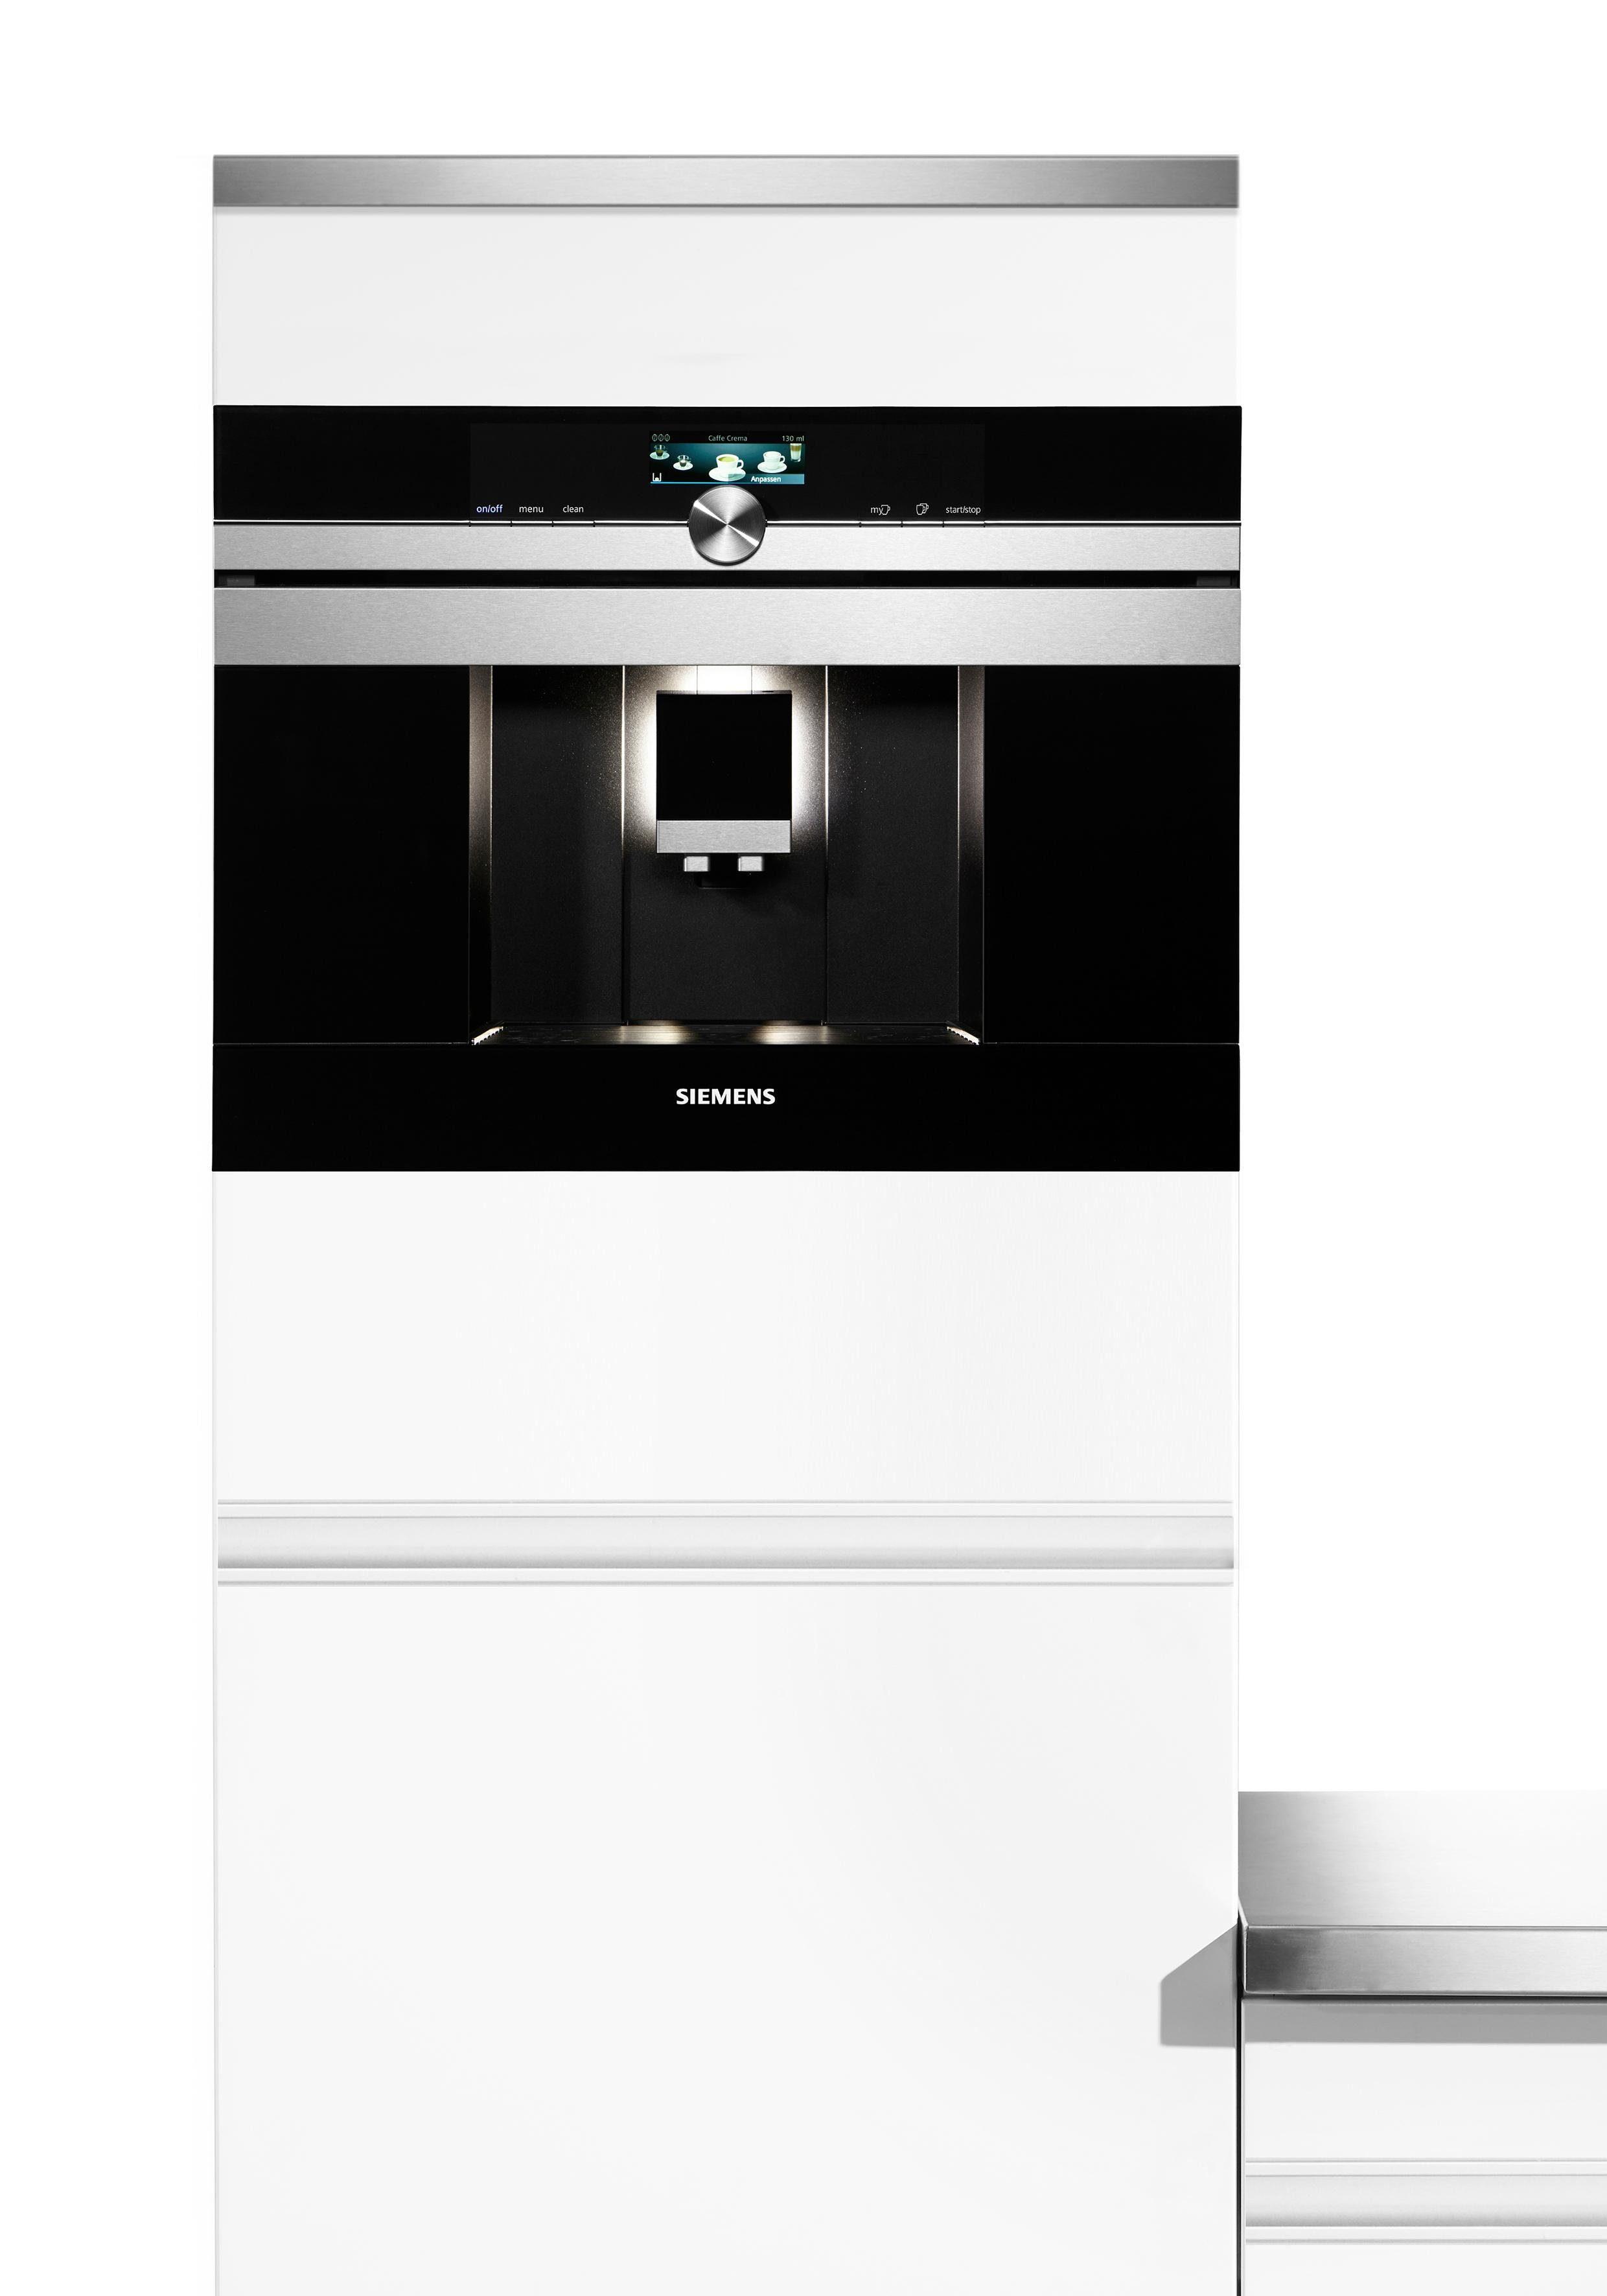 Siemens Kaffeevollautomat CT636LES1 mit Milchbehälter, edelstahl